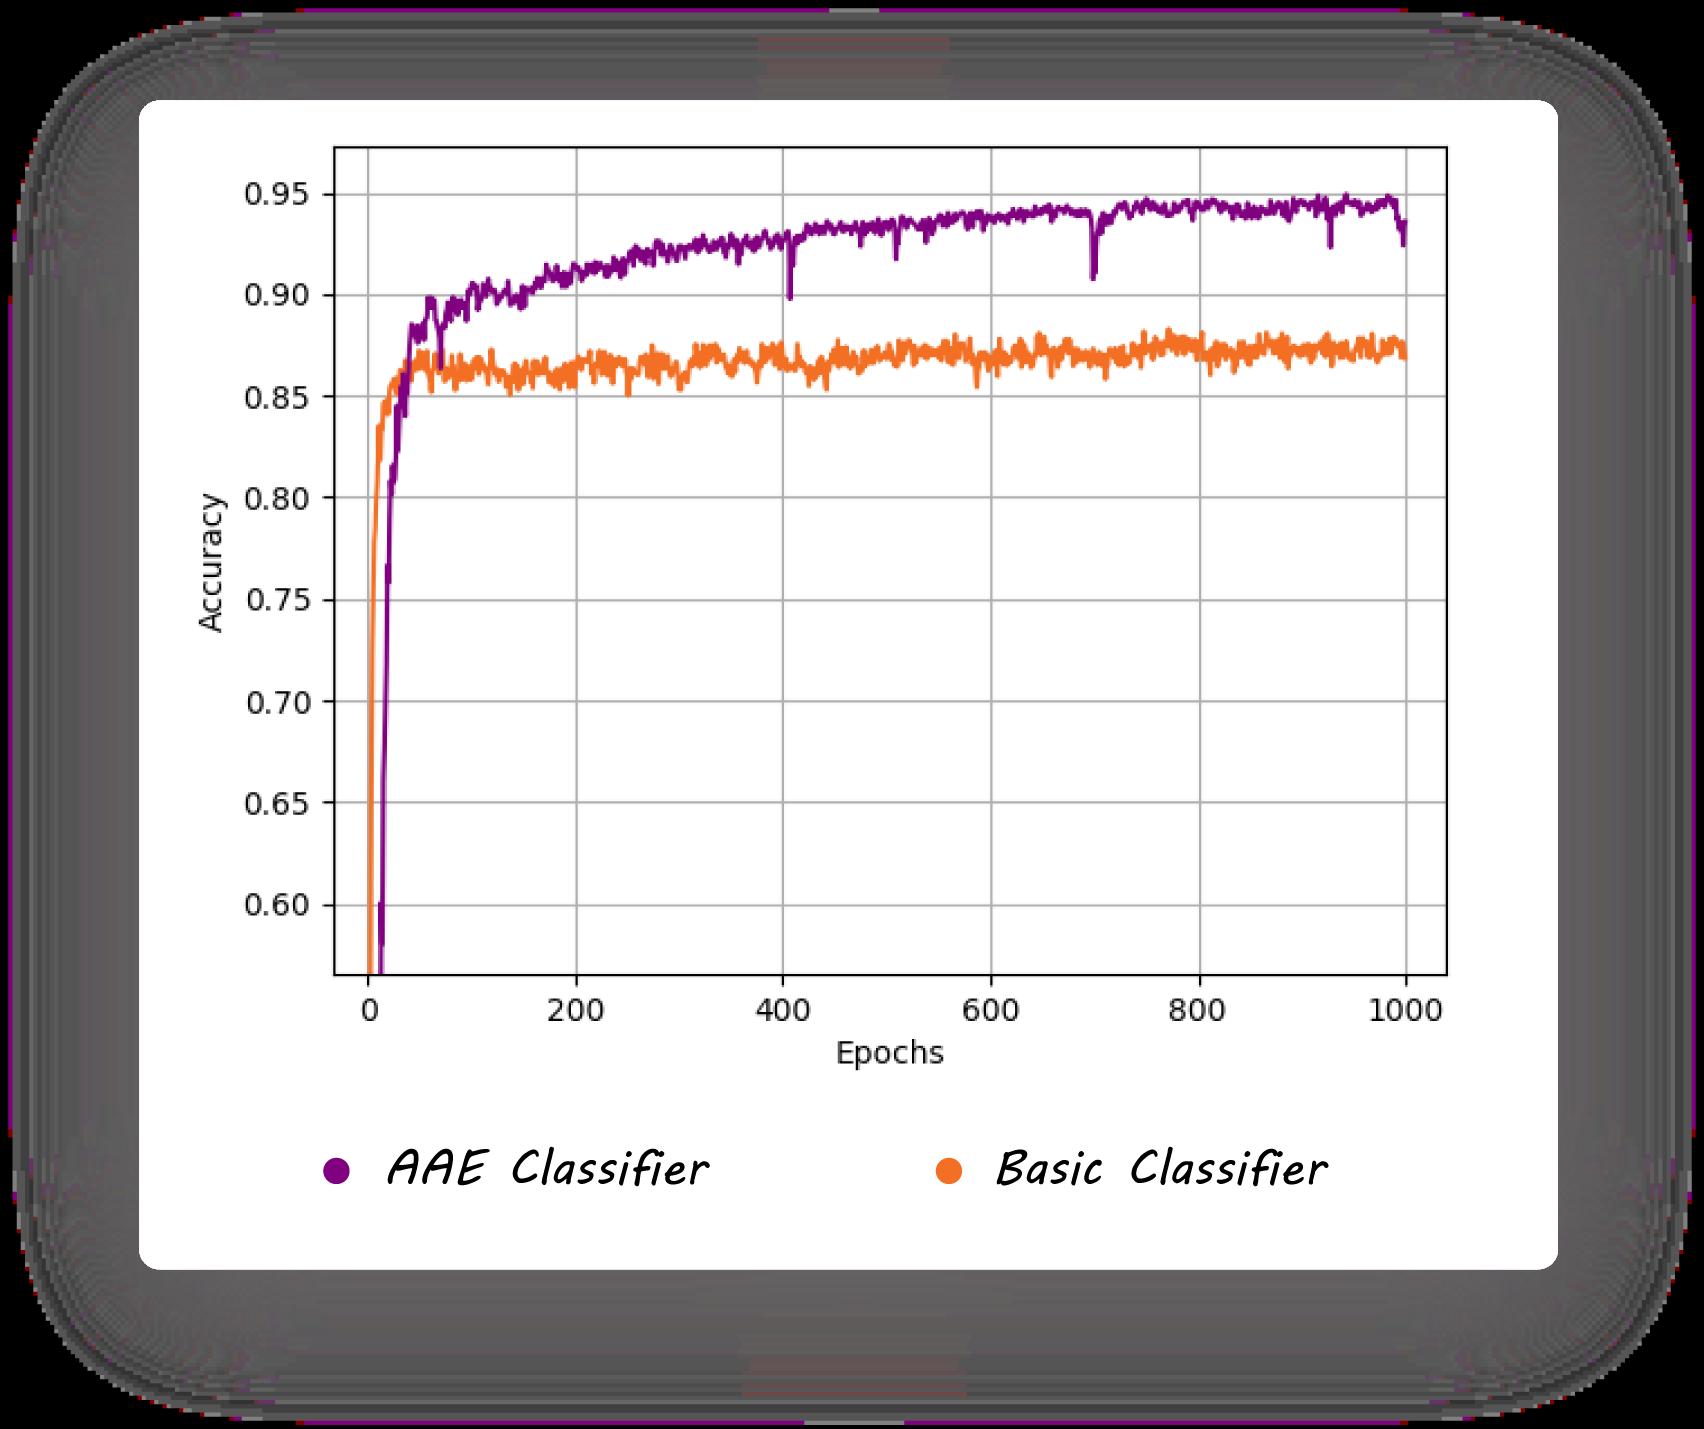 Adversarial Search - CMSC 421 - UMD - GradeBuddy